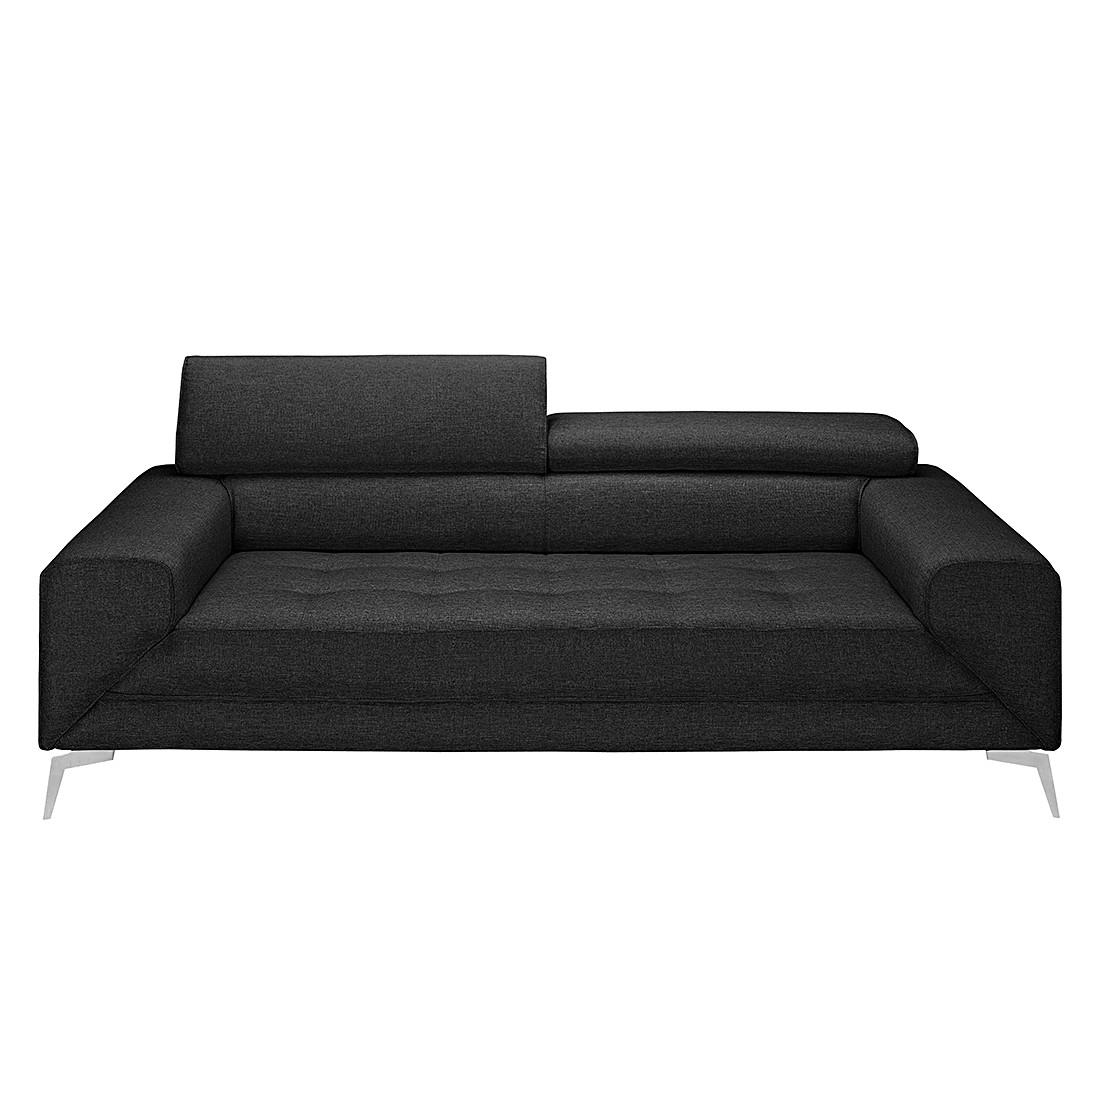 Sofa Walden (3-Sitzer) Webstoff